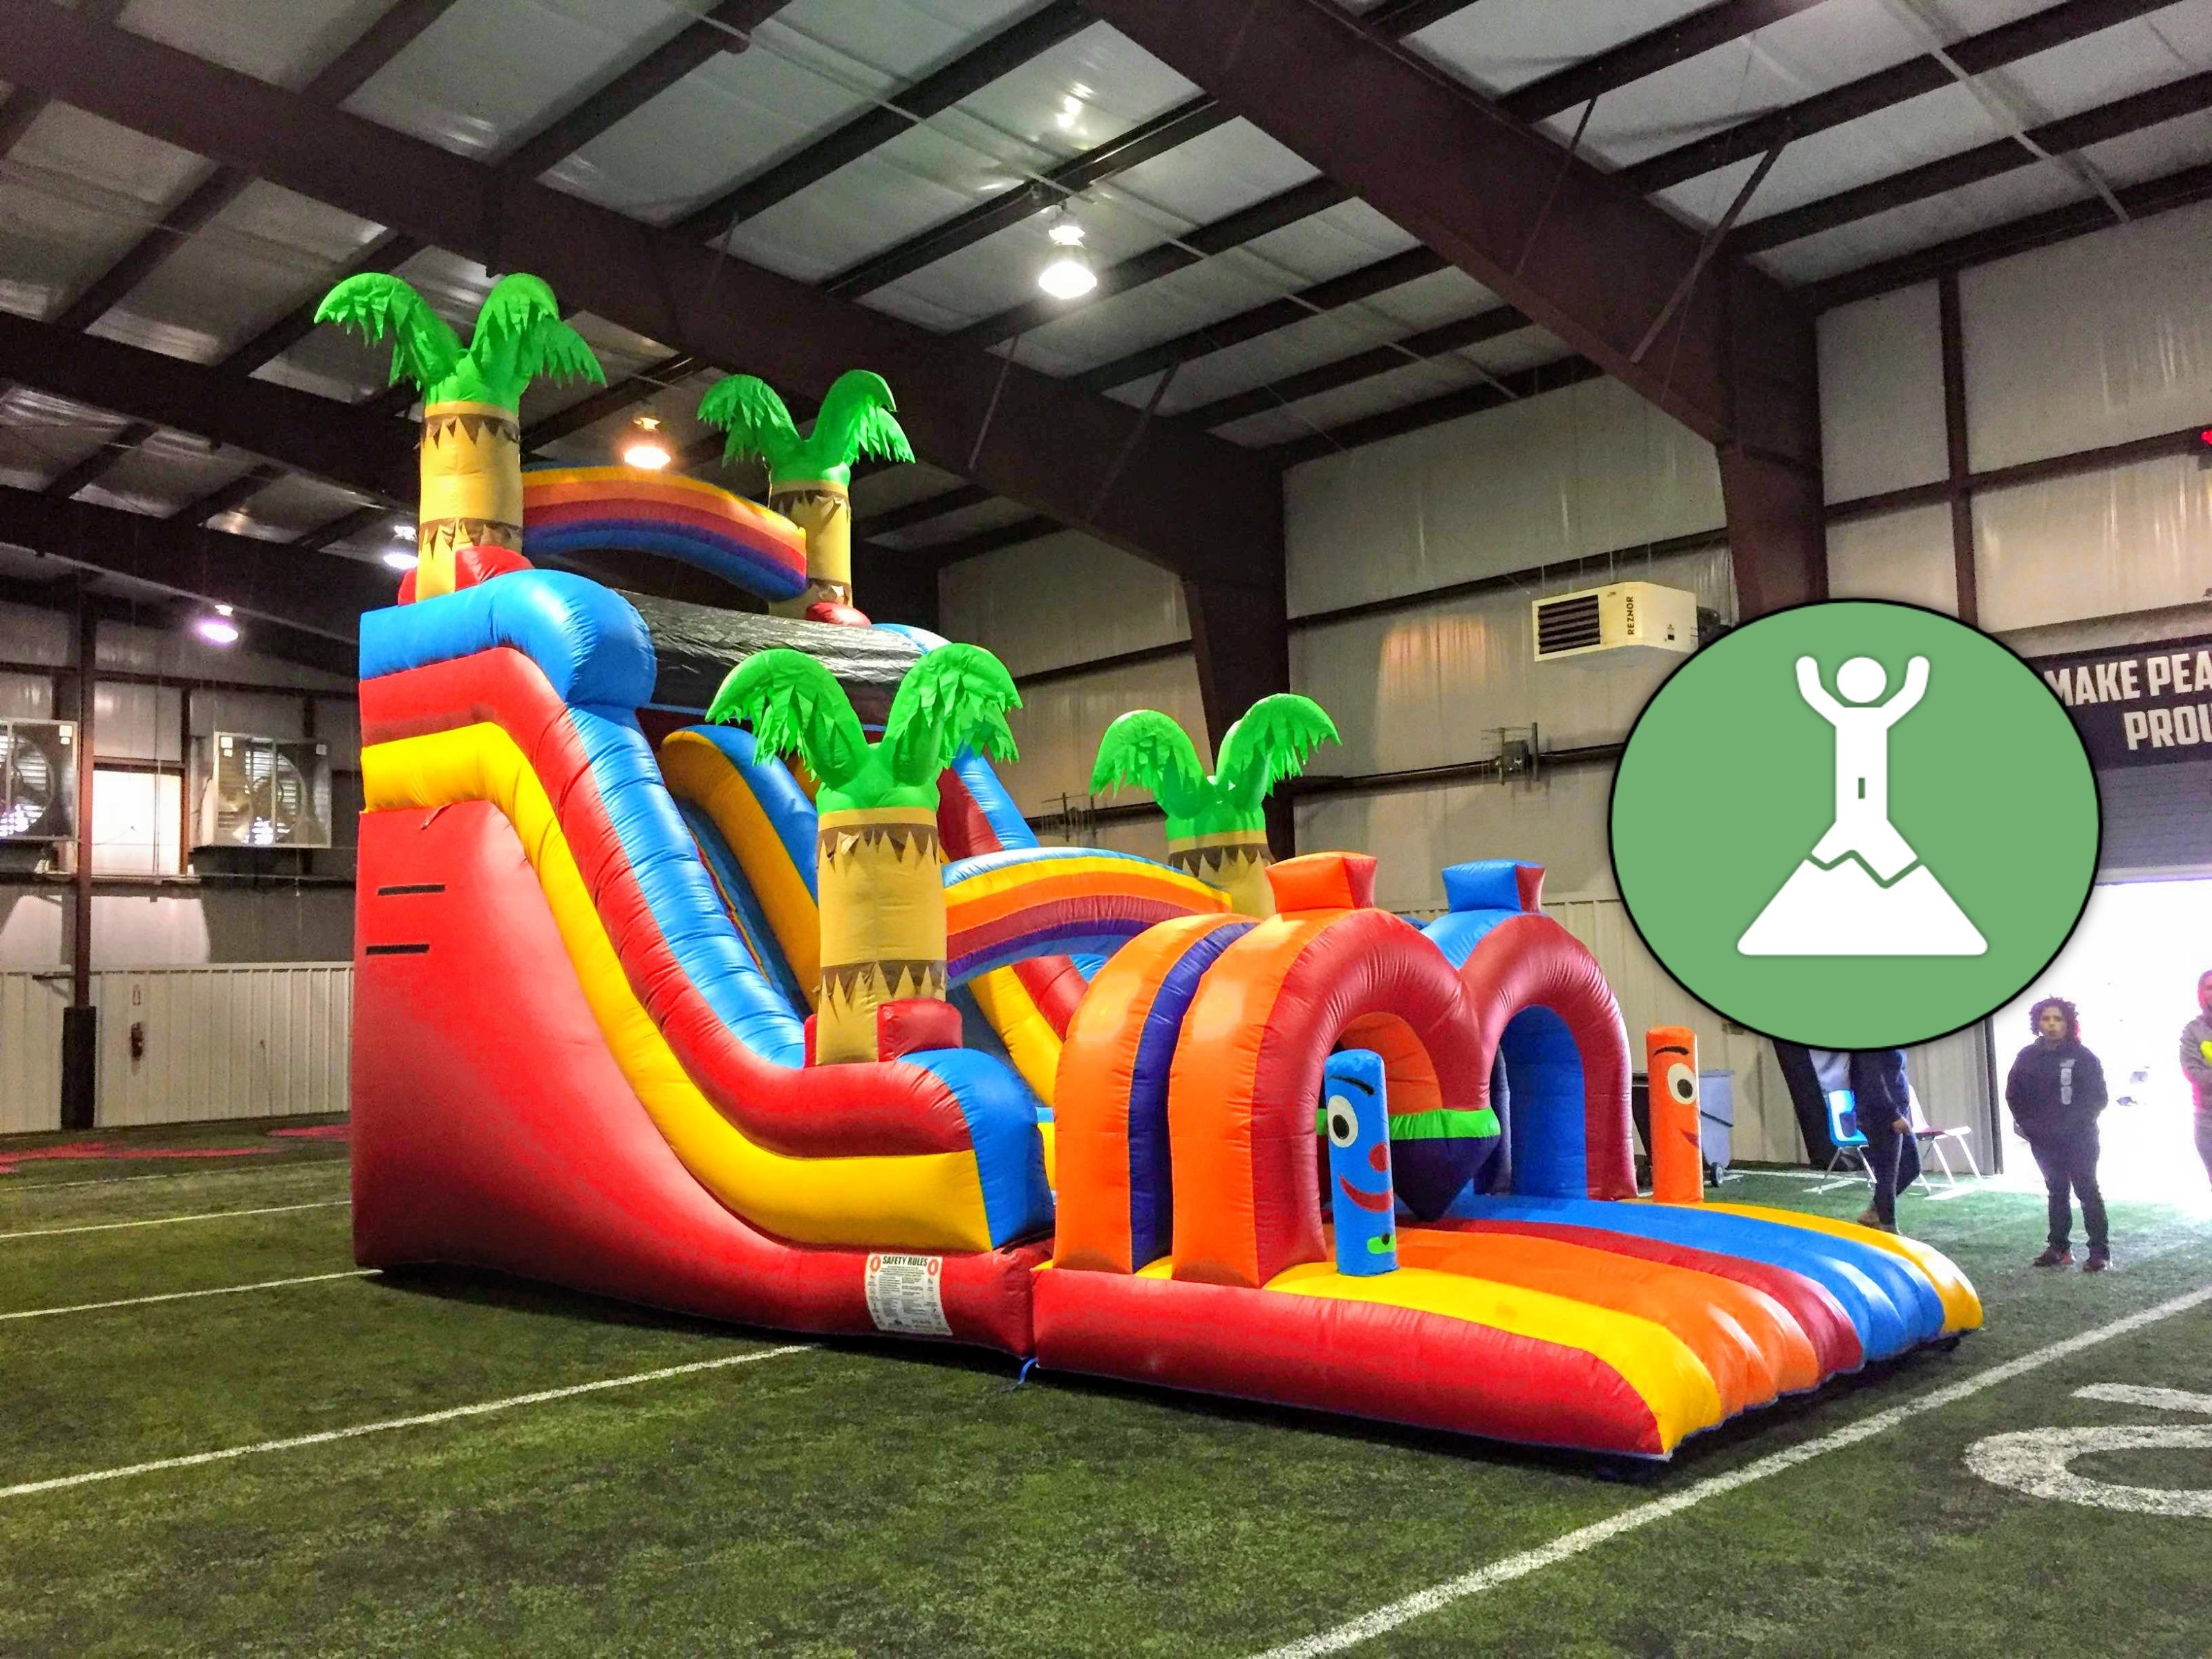 huge inflatable slides northwest arkansas bounce houses